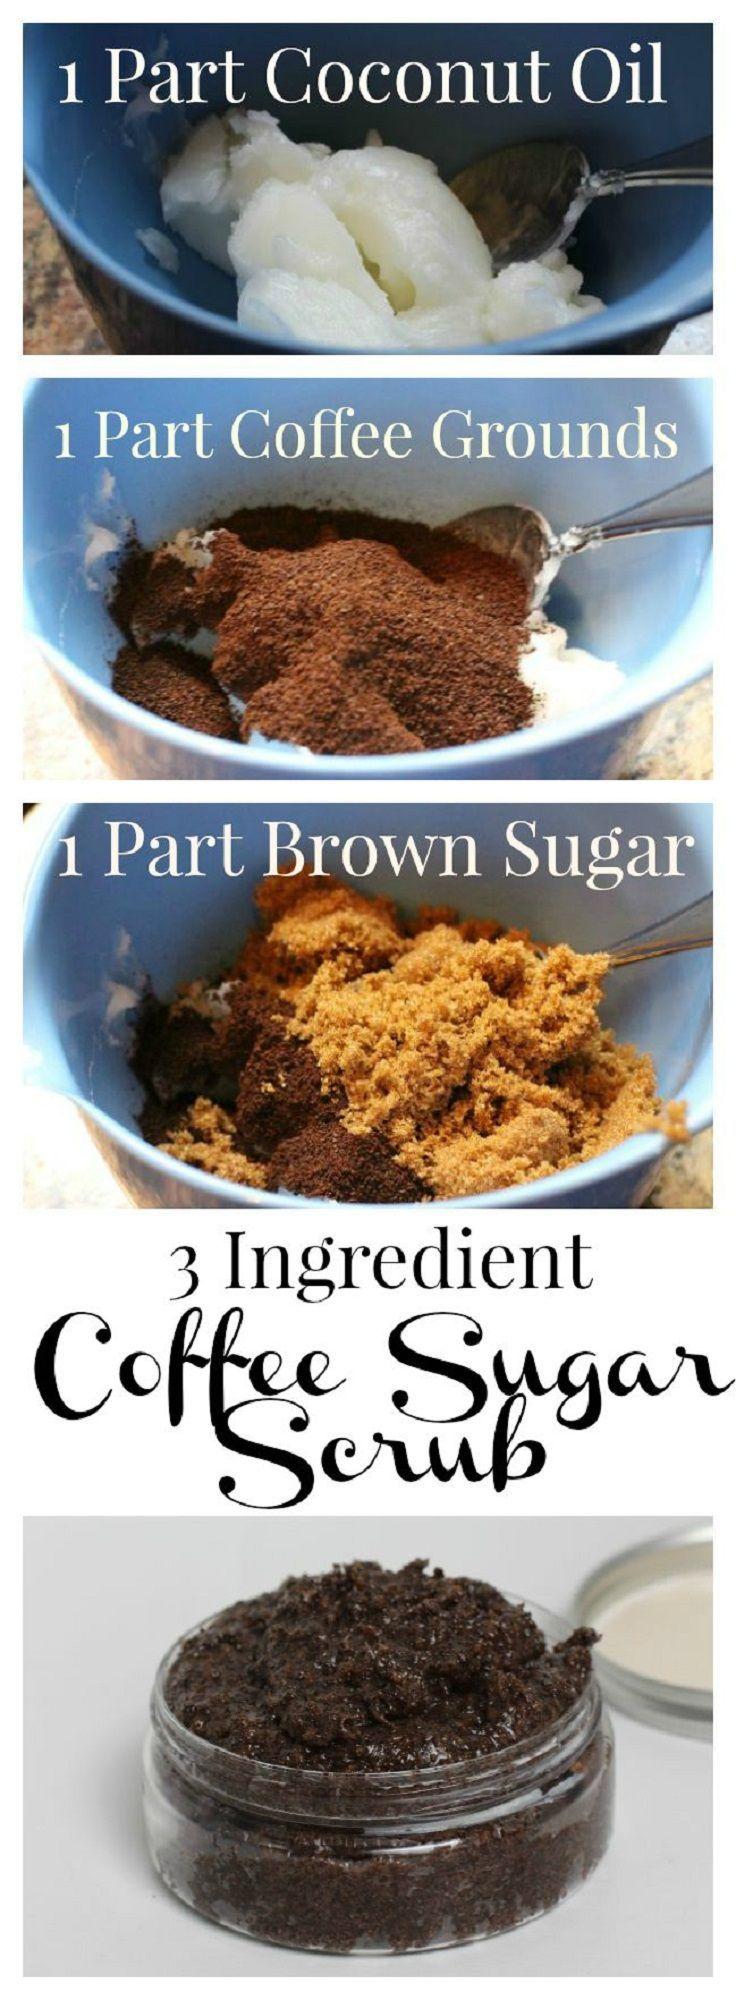 homemade coffee scrub for cellulite